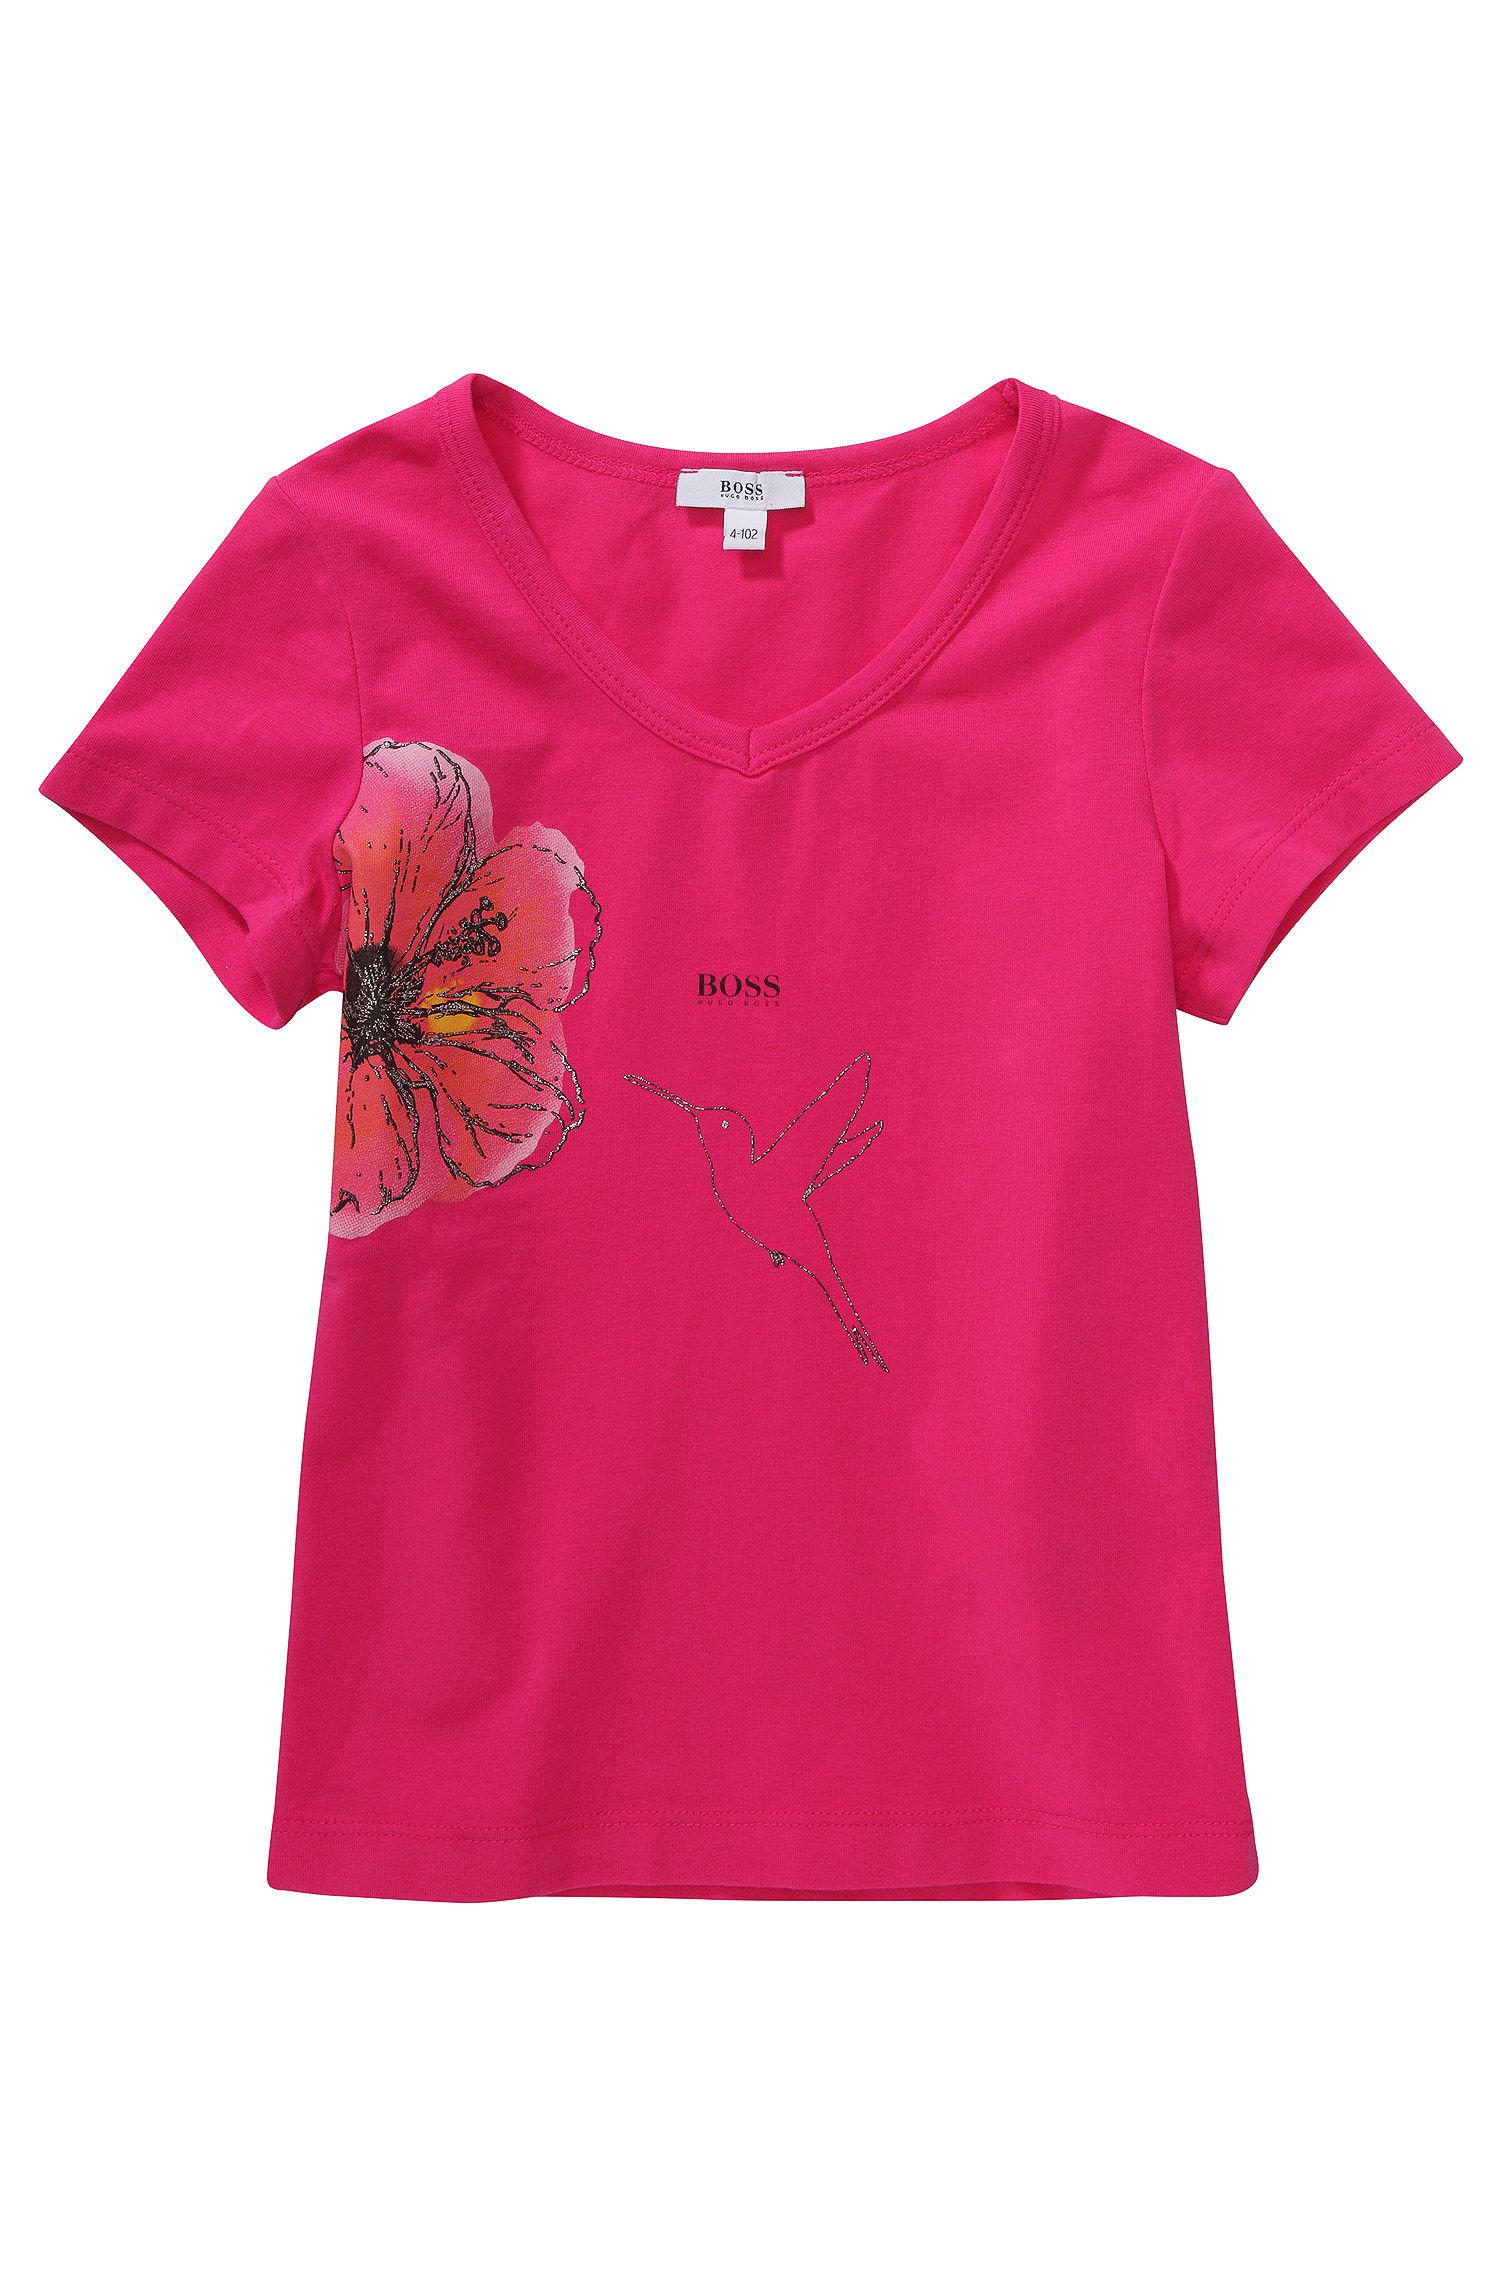 Kids-T-Shirt ´J15292` mit Blumen- und Kolibri-Print